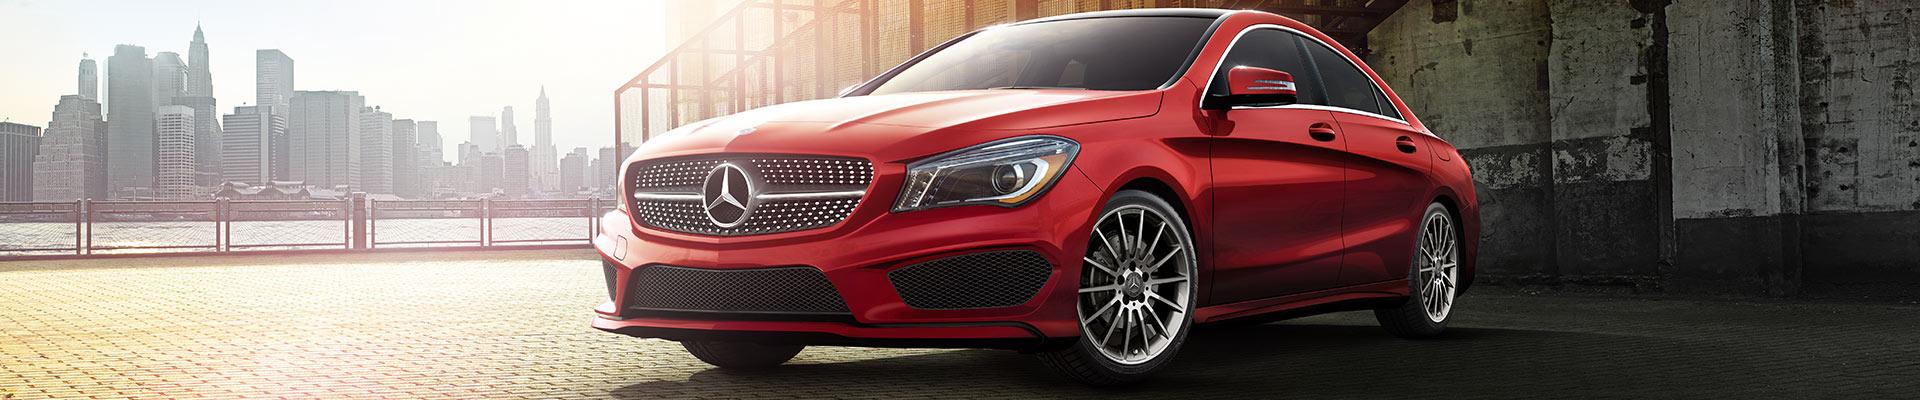 Schumacher Mercedes Benz Conquest Automotive